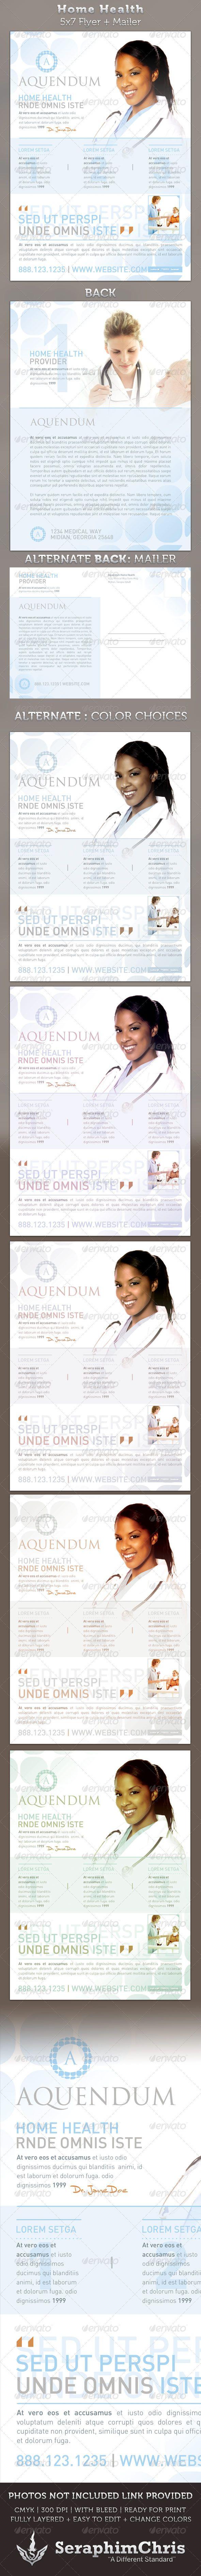 Home Health 5x7 Medical Healthcare Flyer & Mailer